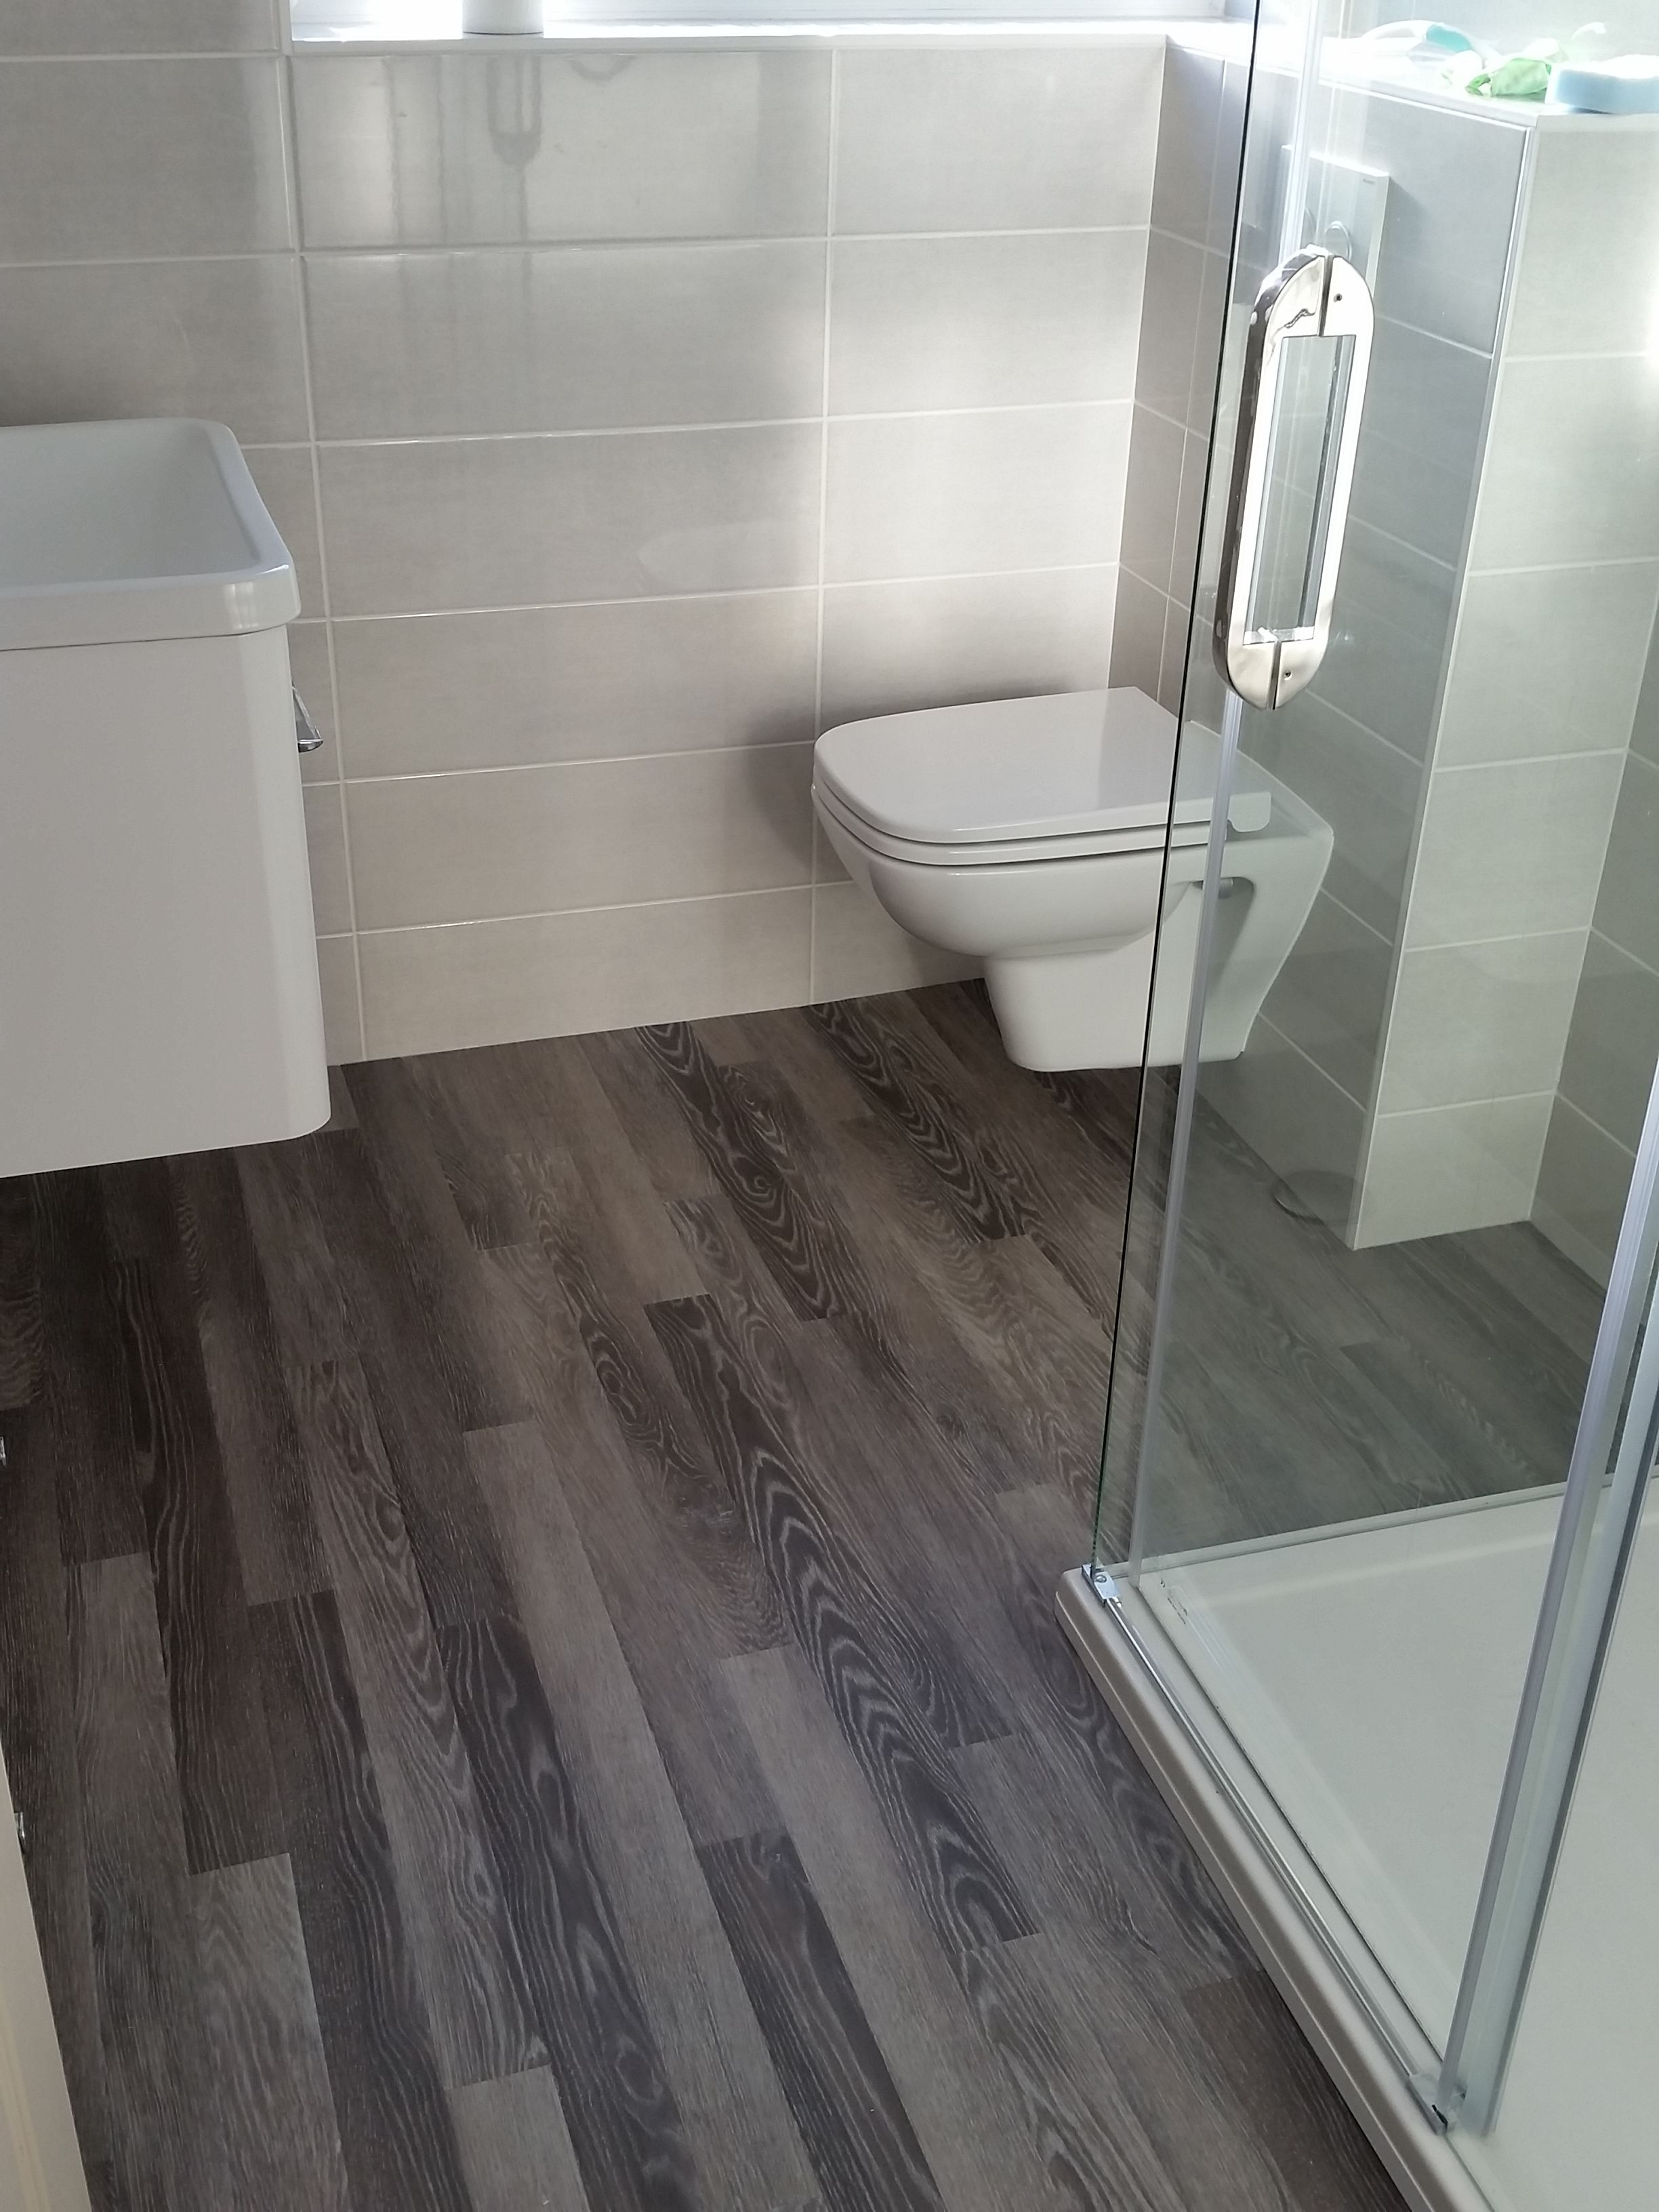 Vinyl Flooring Bathroom Wood Tile Bathroom Bathroom Vinyl